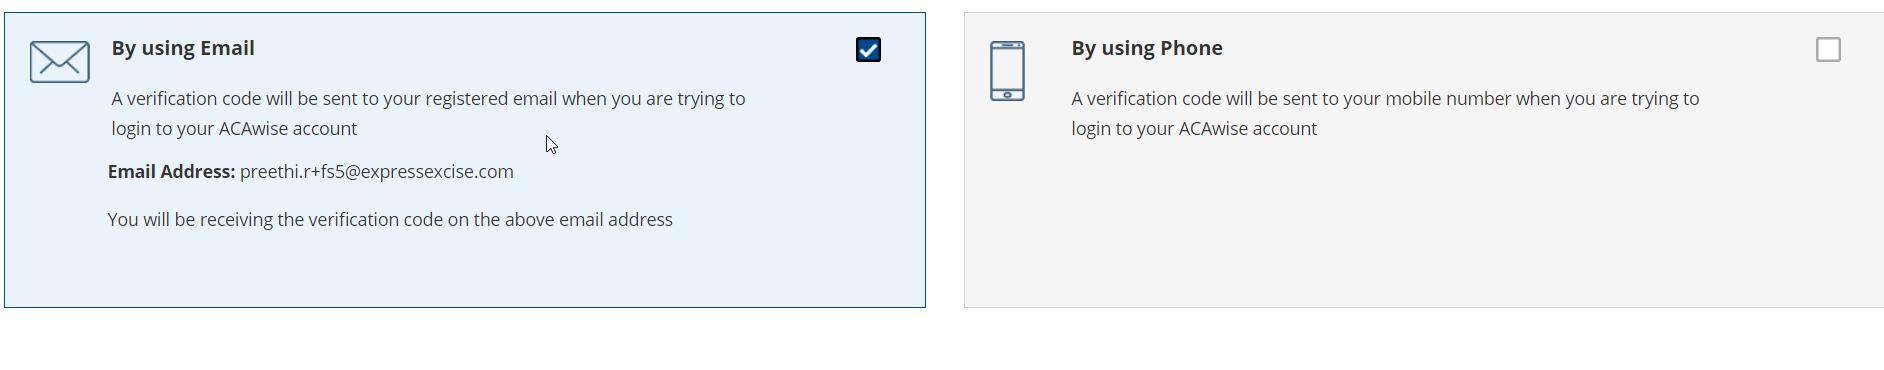 ACAwise 2-step verification